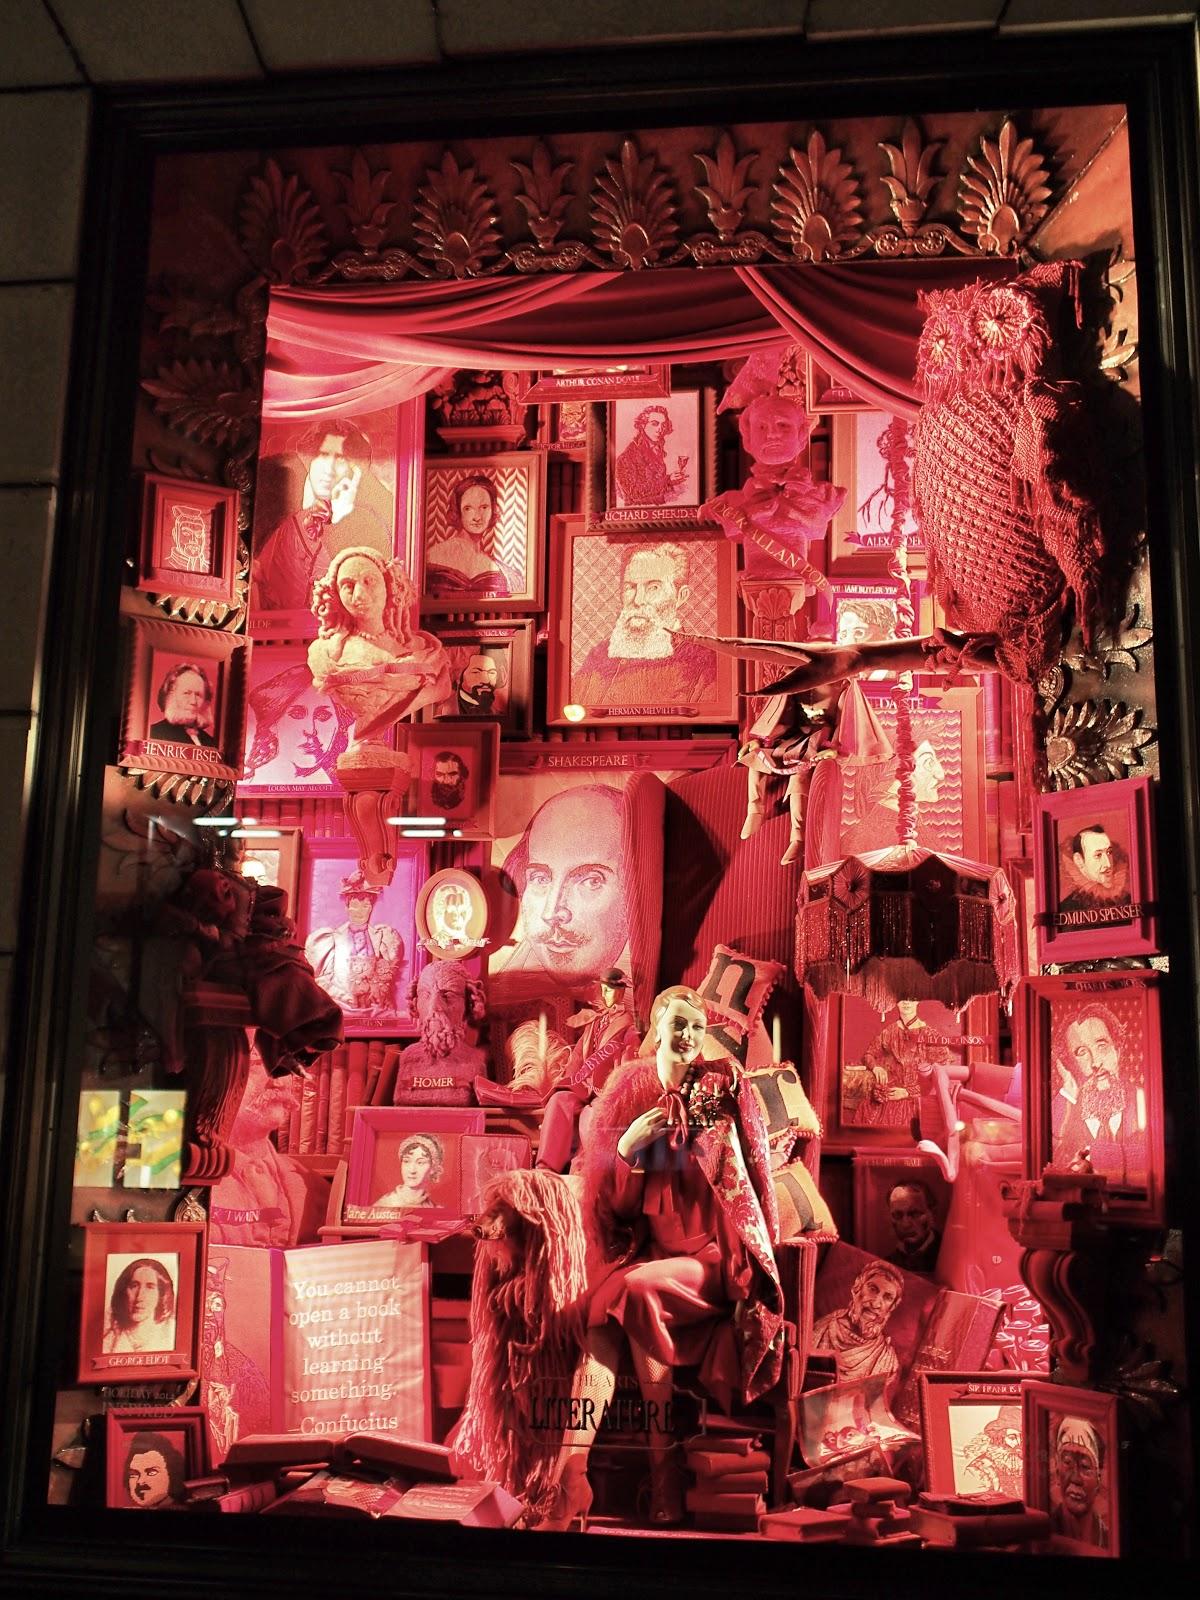 Inspired by Literature #inspiredbyliterature #bgwindows # #holidaywindows #5thavenuewindows #NYC  #holidays #besttimeoftheyear #nyc ©2014 Nancy Lundebjerg